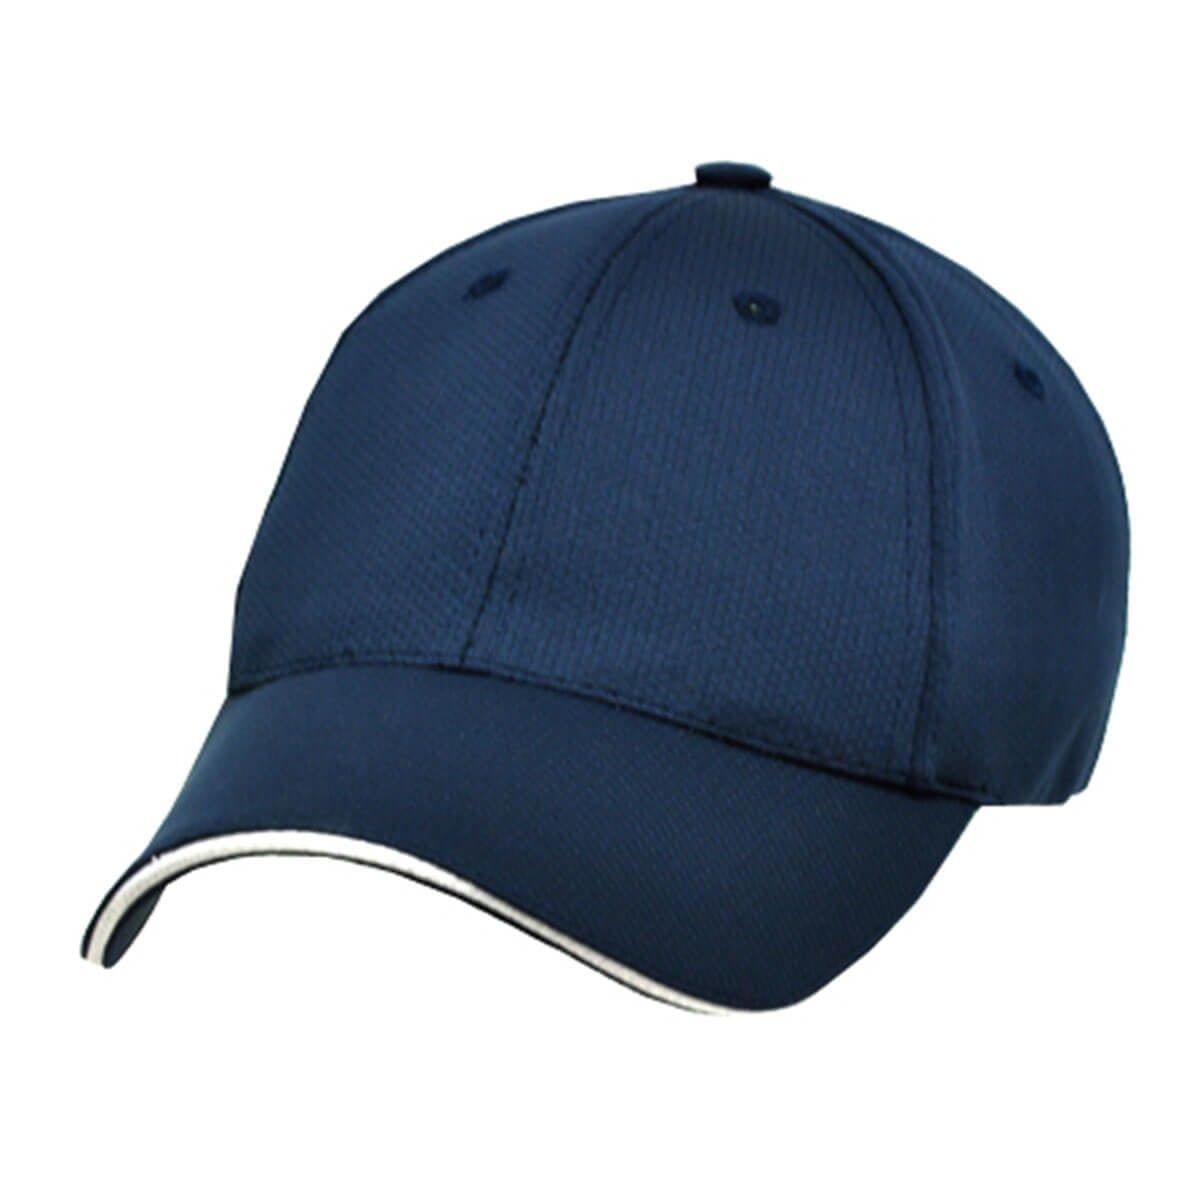 100% RPET Cap-Navy / White